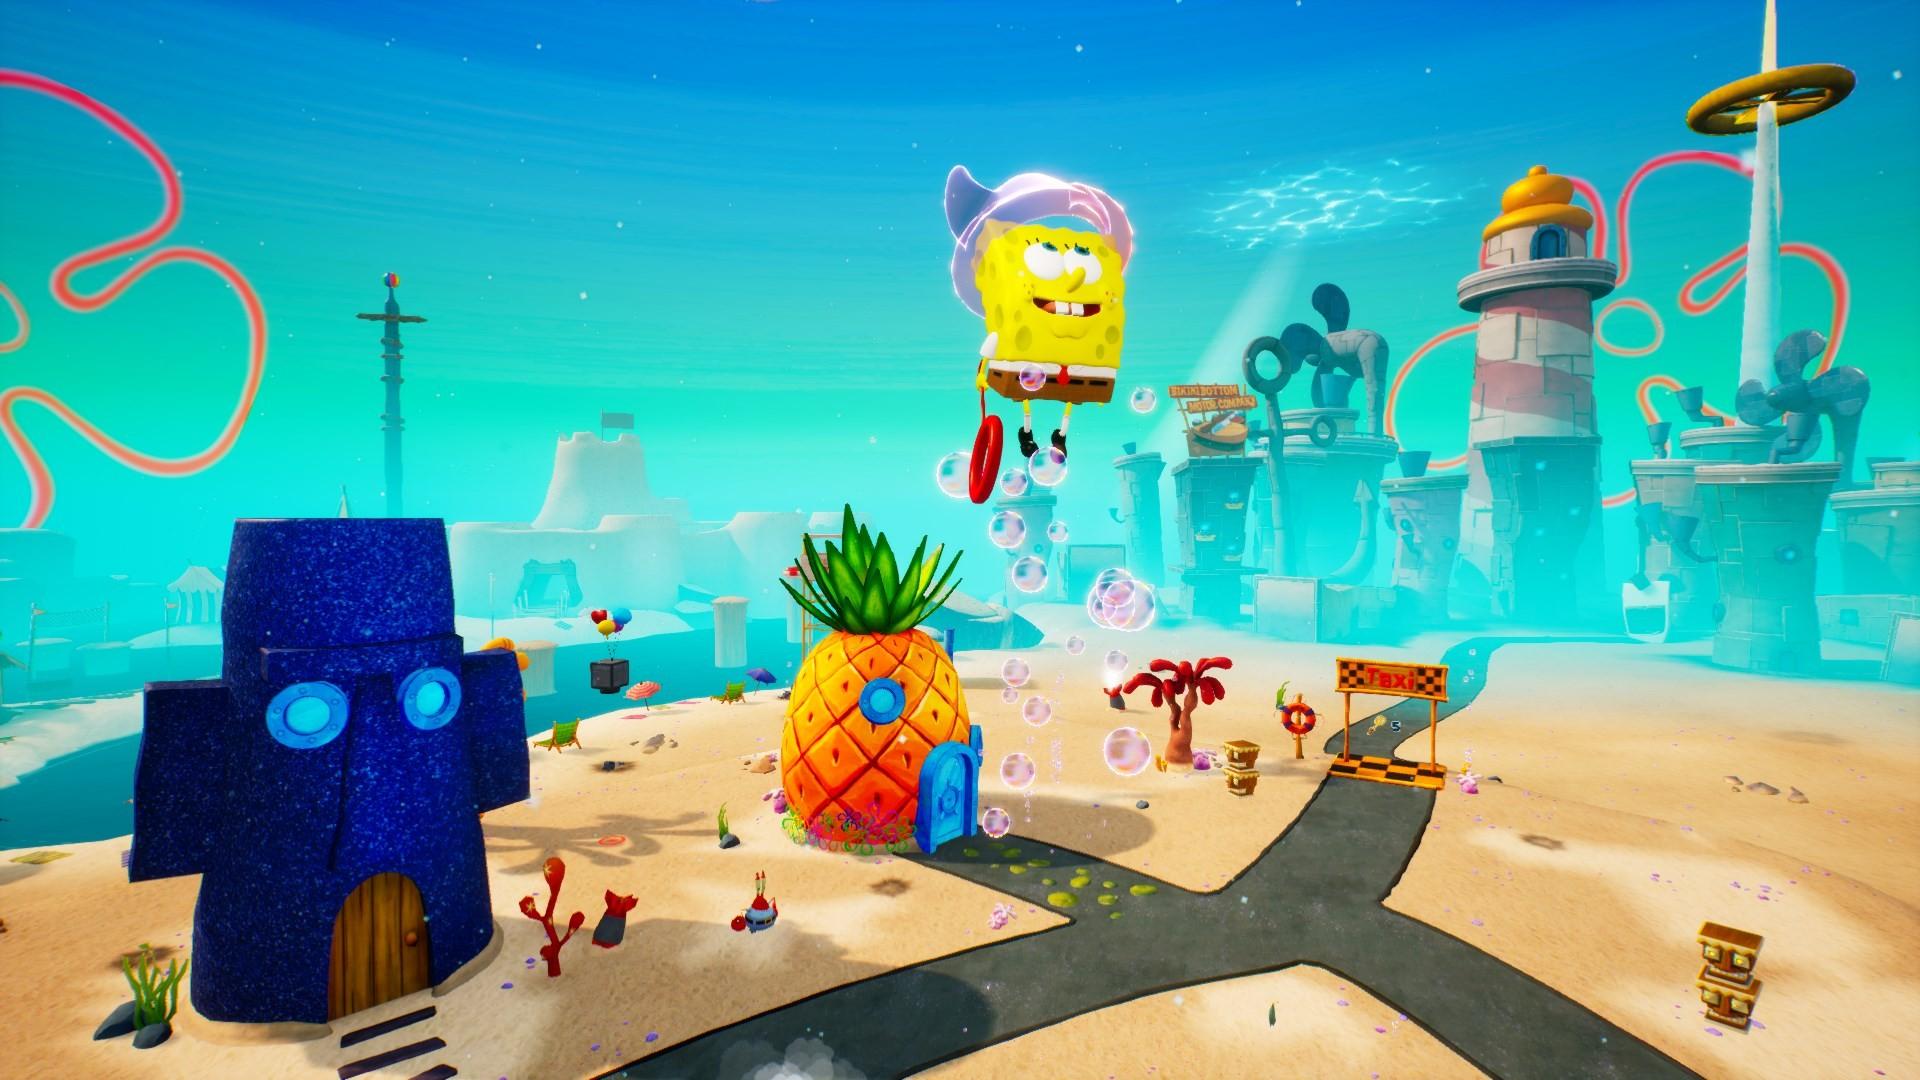 SpongeBob SquarePants: Battle for Bikini Bottom – Rehydrated – June 23